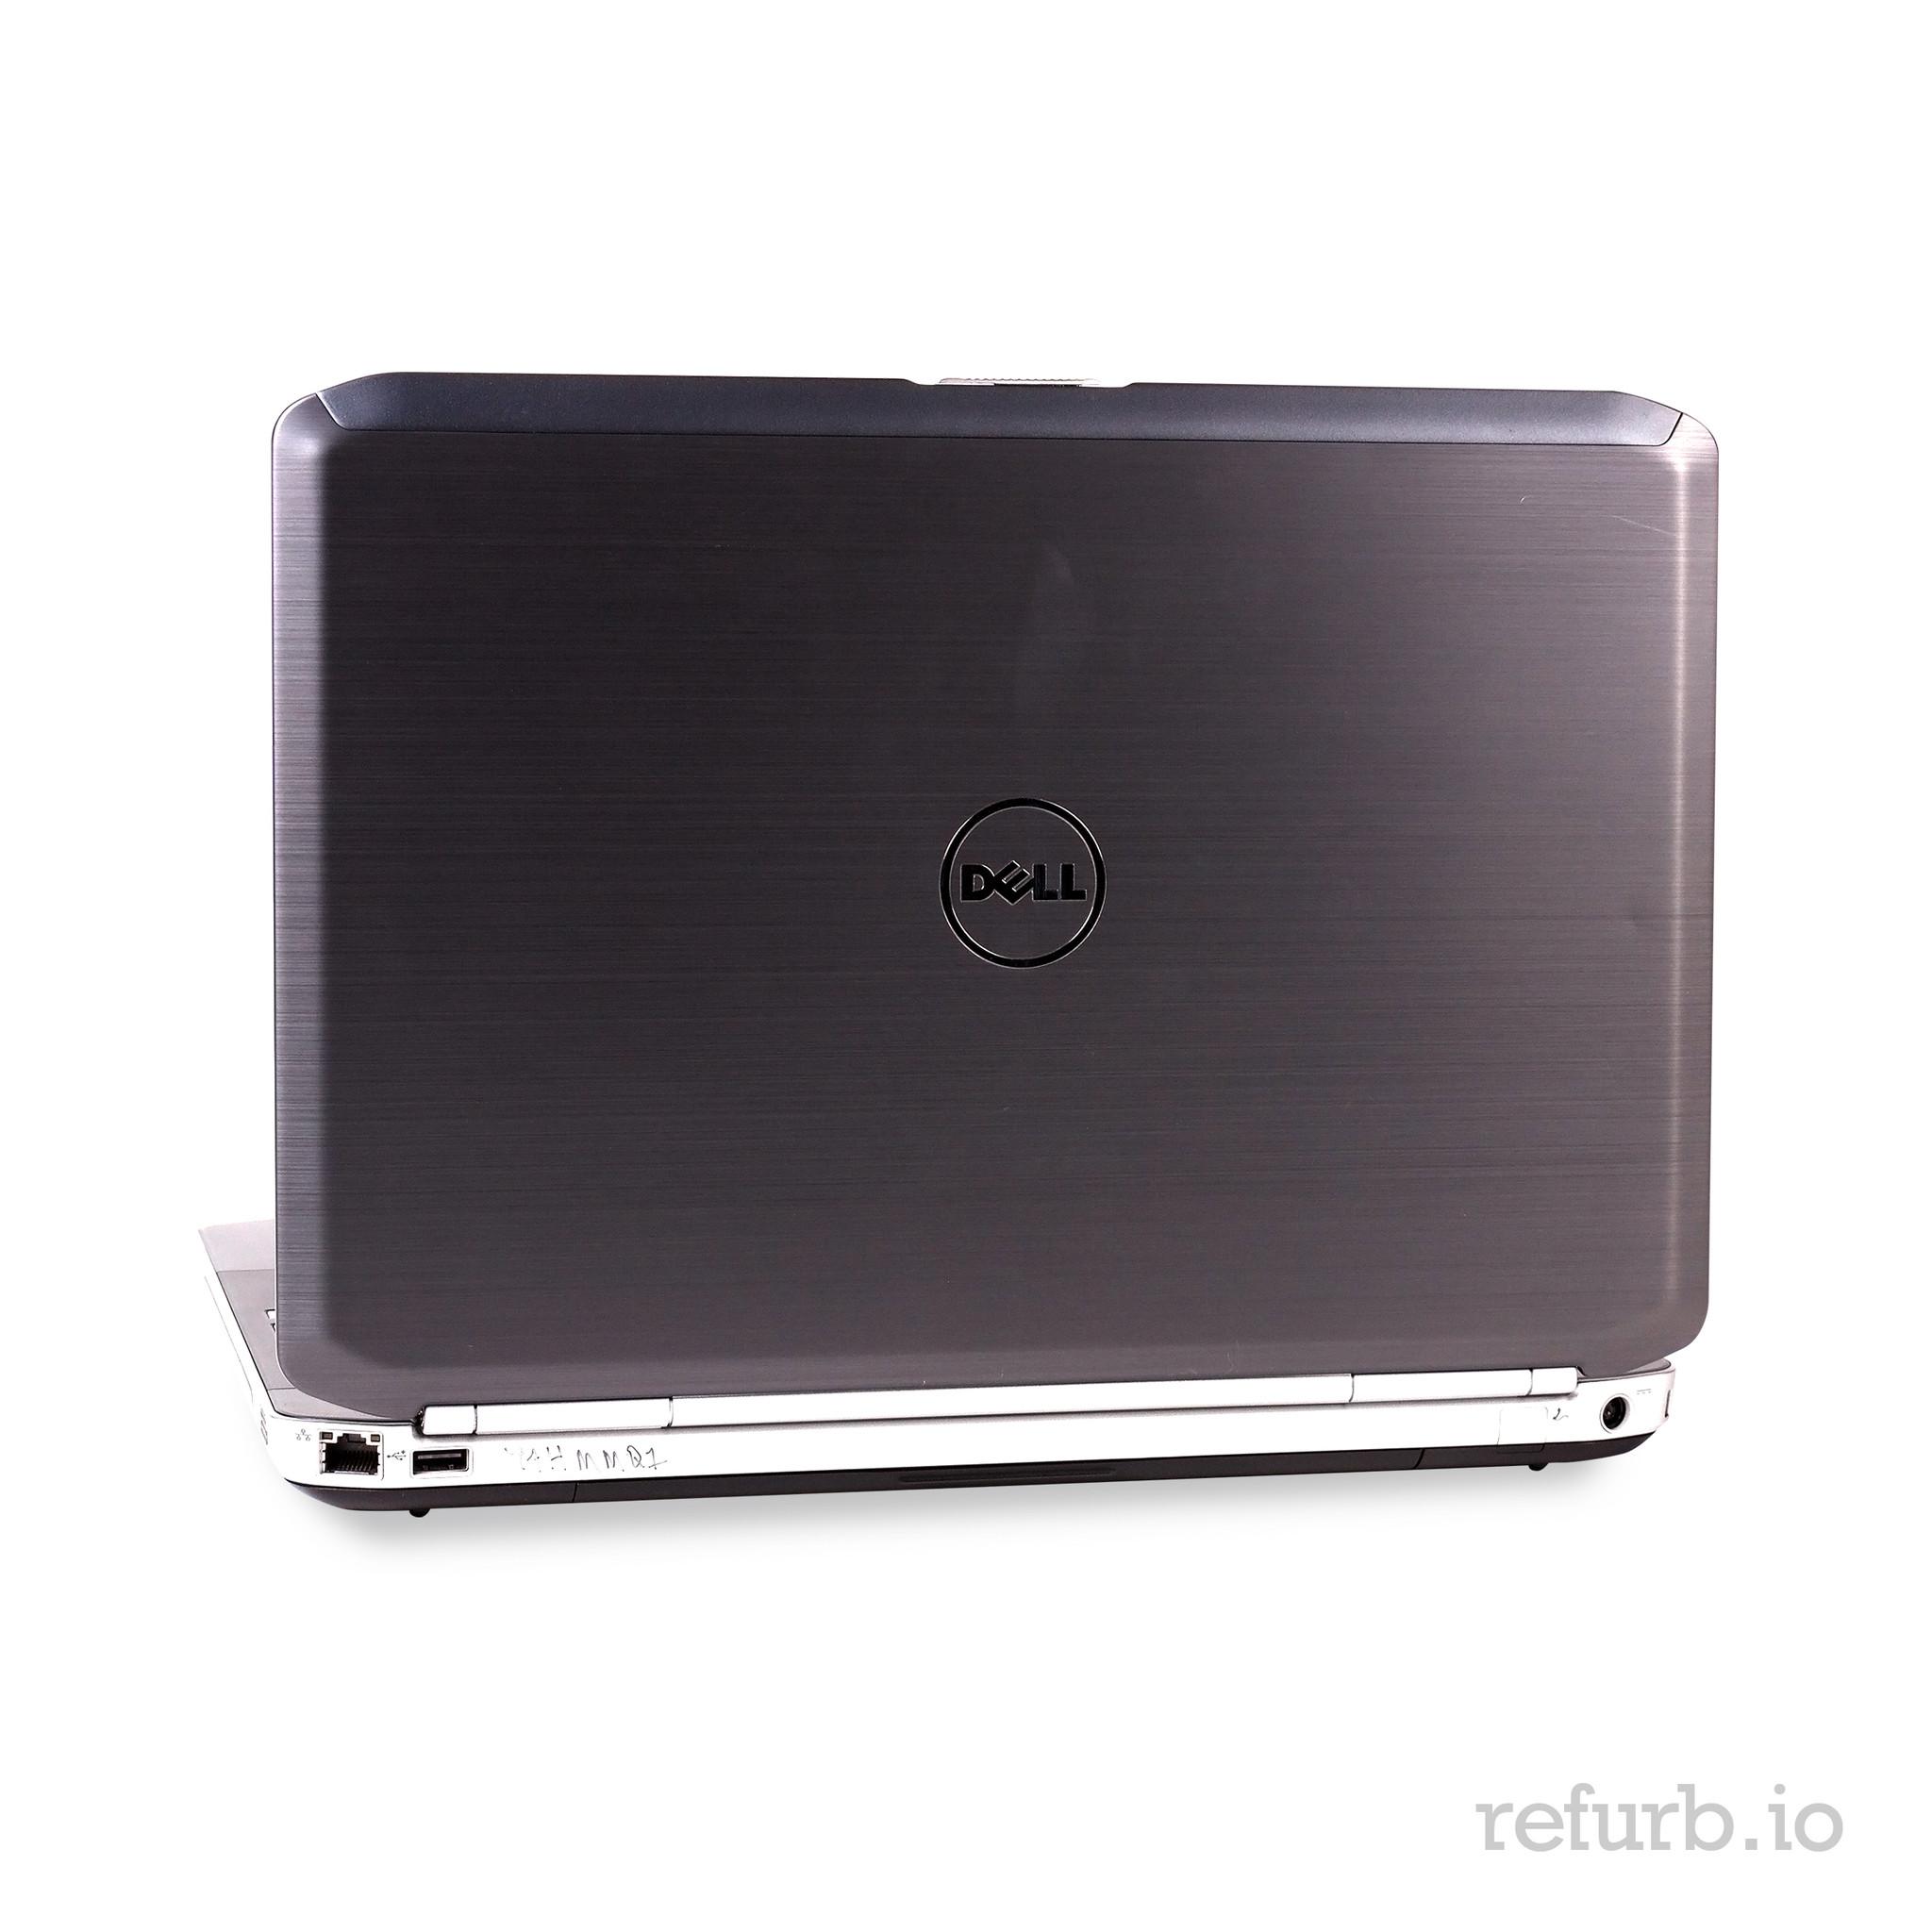 DELL LATITUDE E5420 LAPTOP, 4GB, 250GB HDD, INTEL i5 2520M 2 5GHz